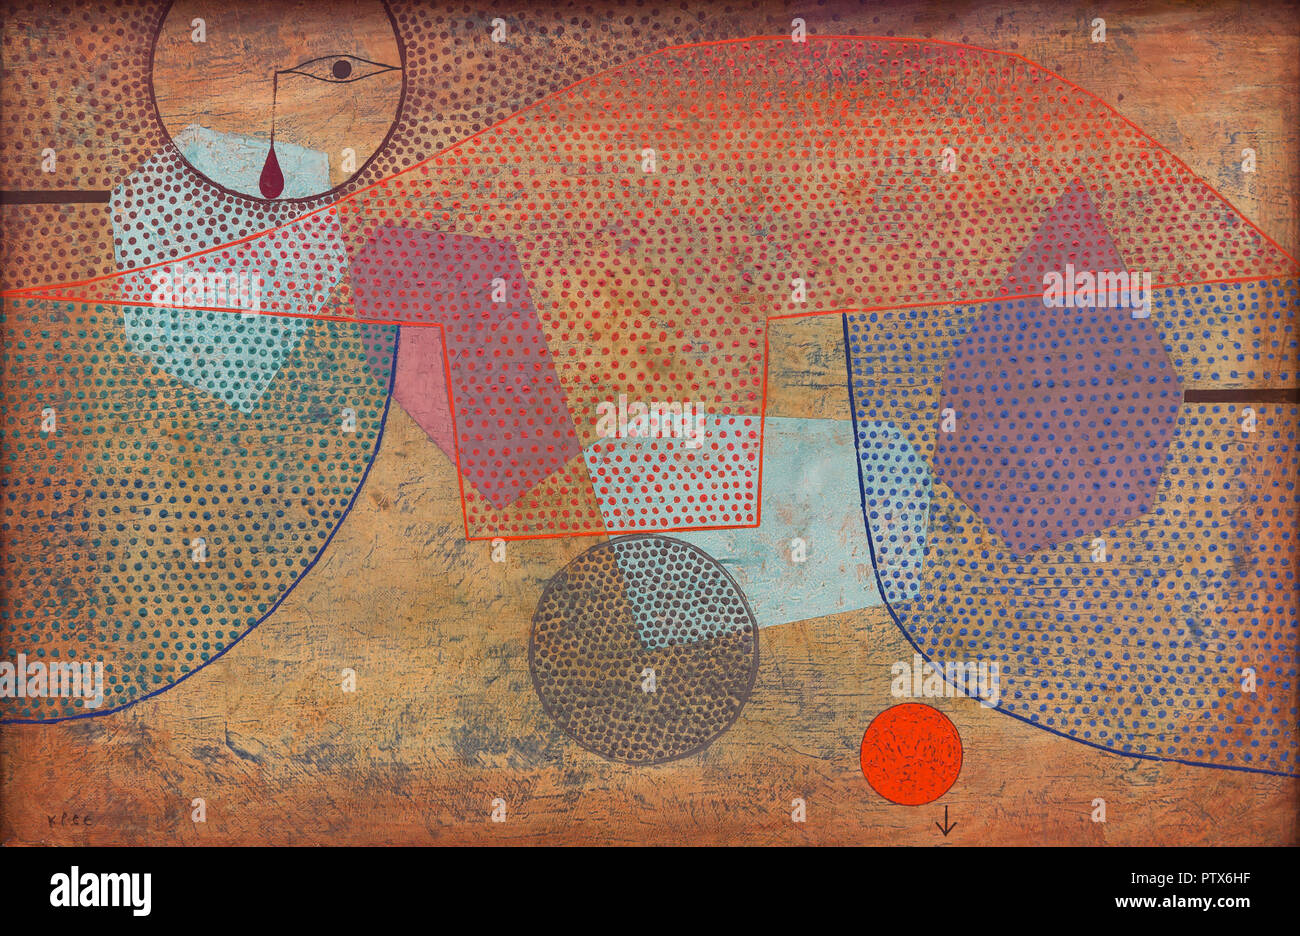 Sunset,  Paul Klee, 1930, Art Institute of Chicago, Chicago, Illinois, USA, North America - Stock Image